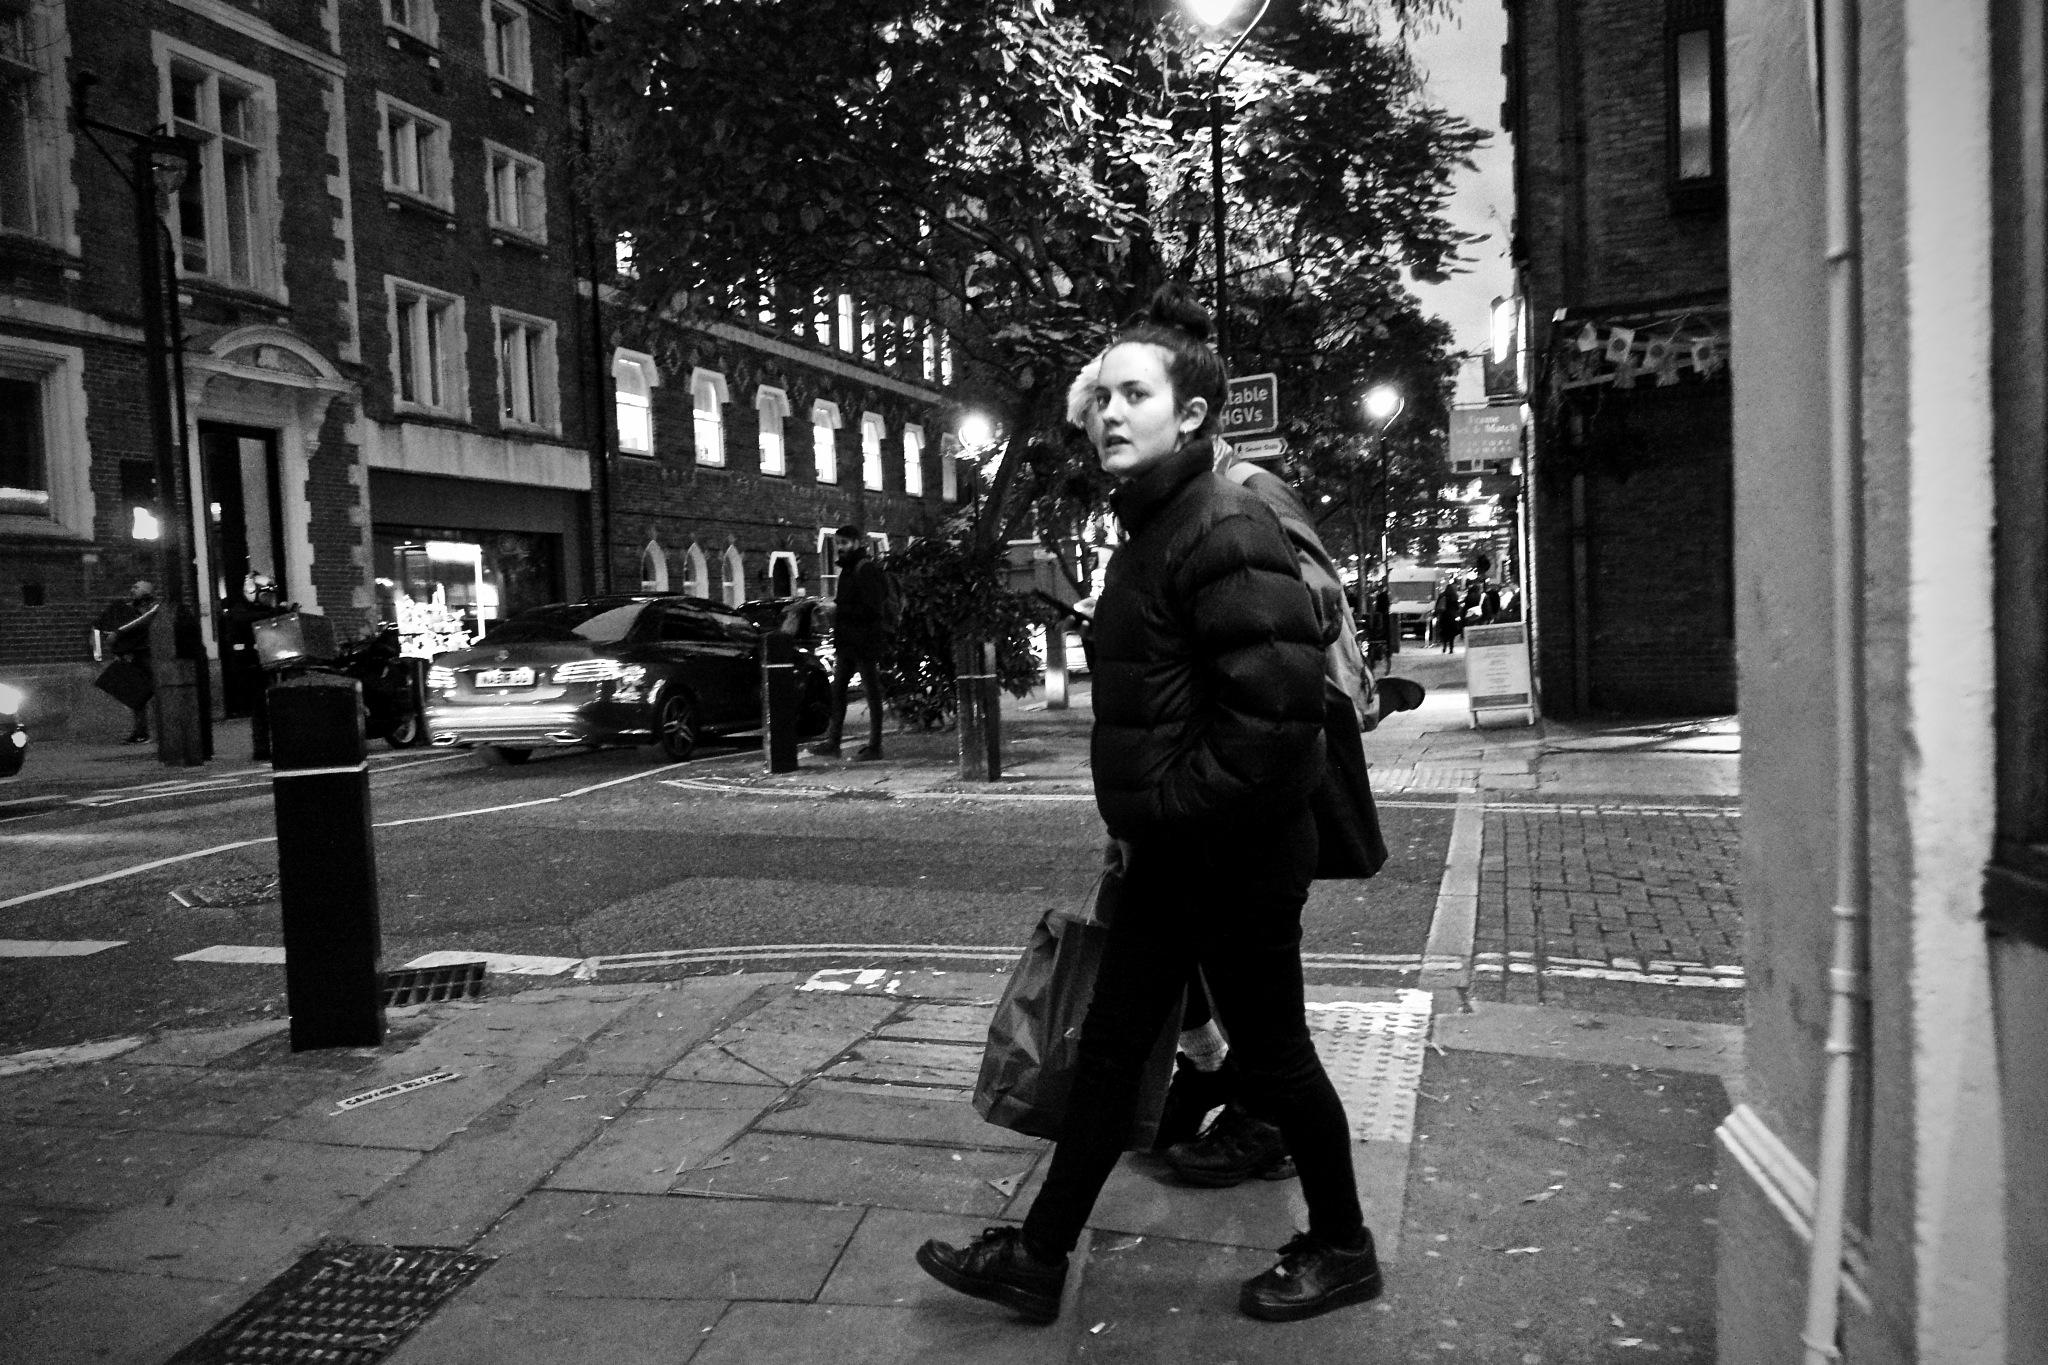 London, UK. by StreetCrusader